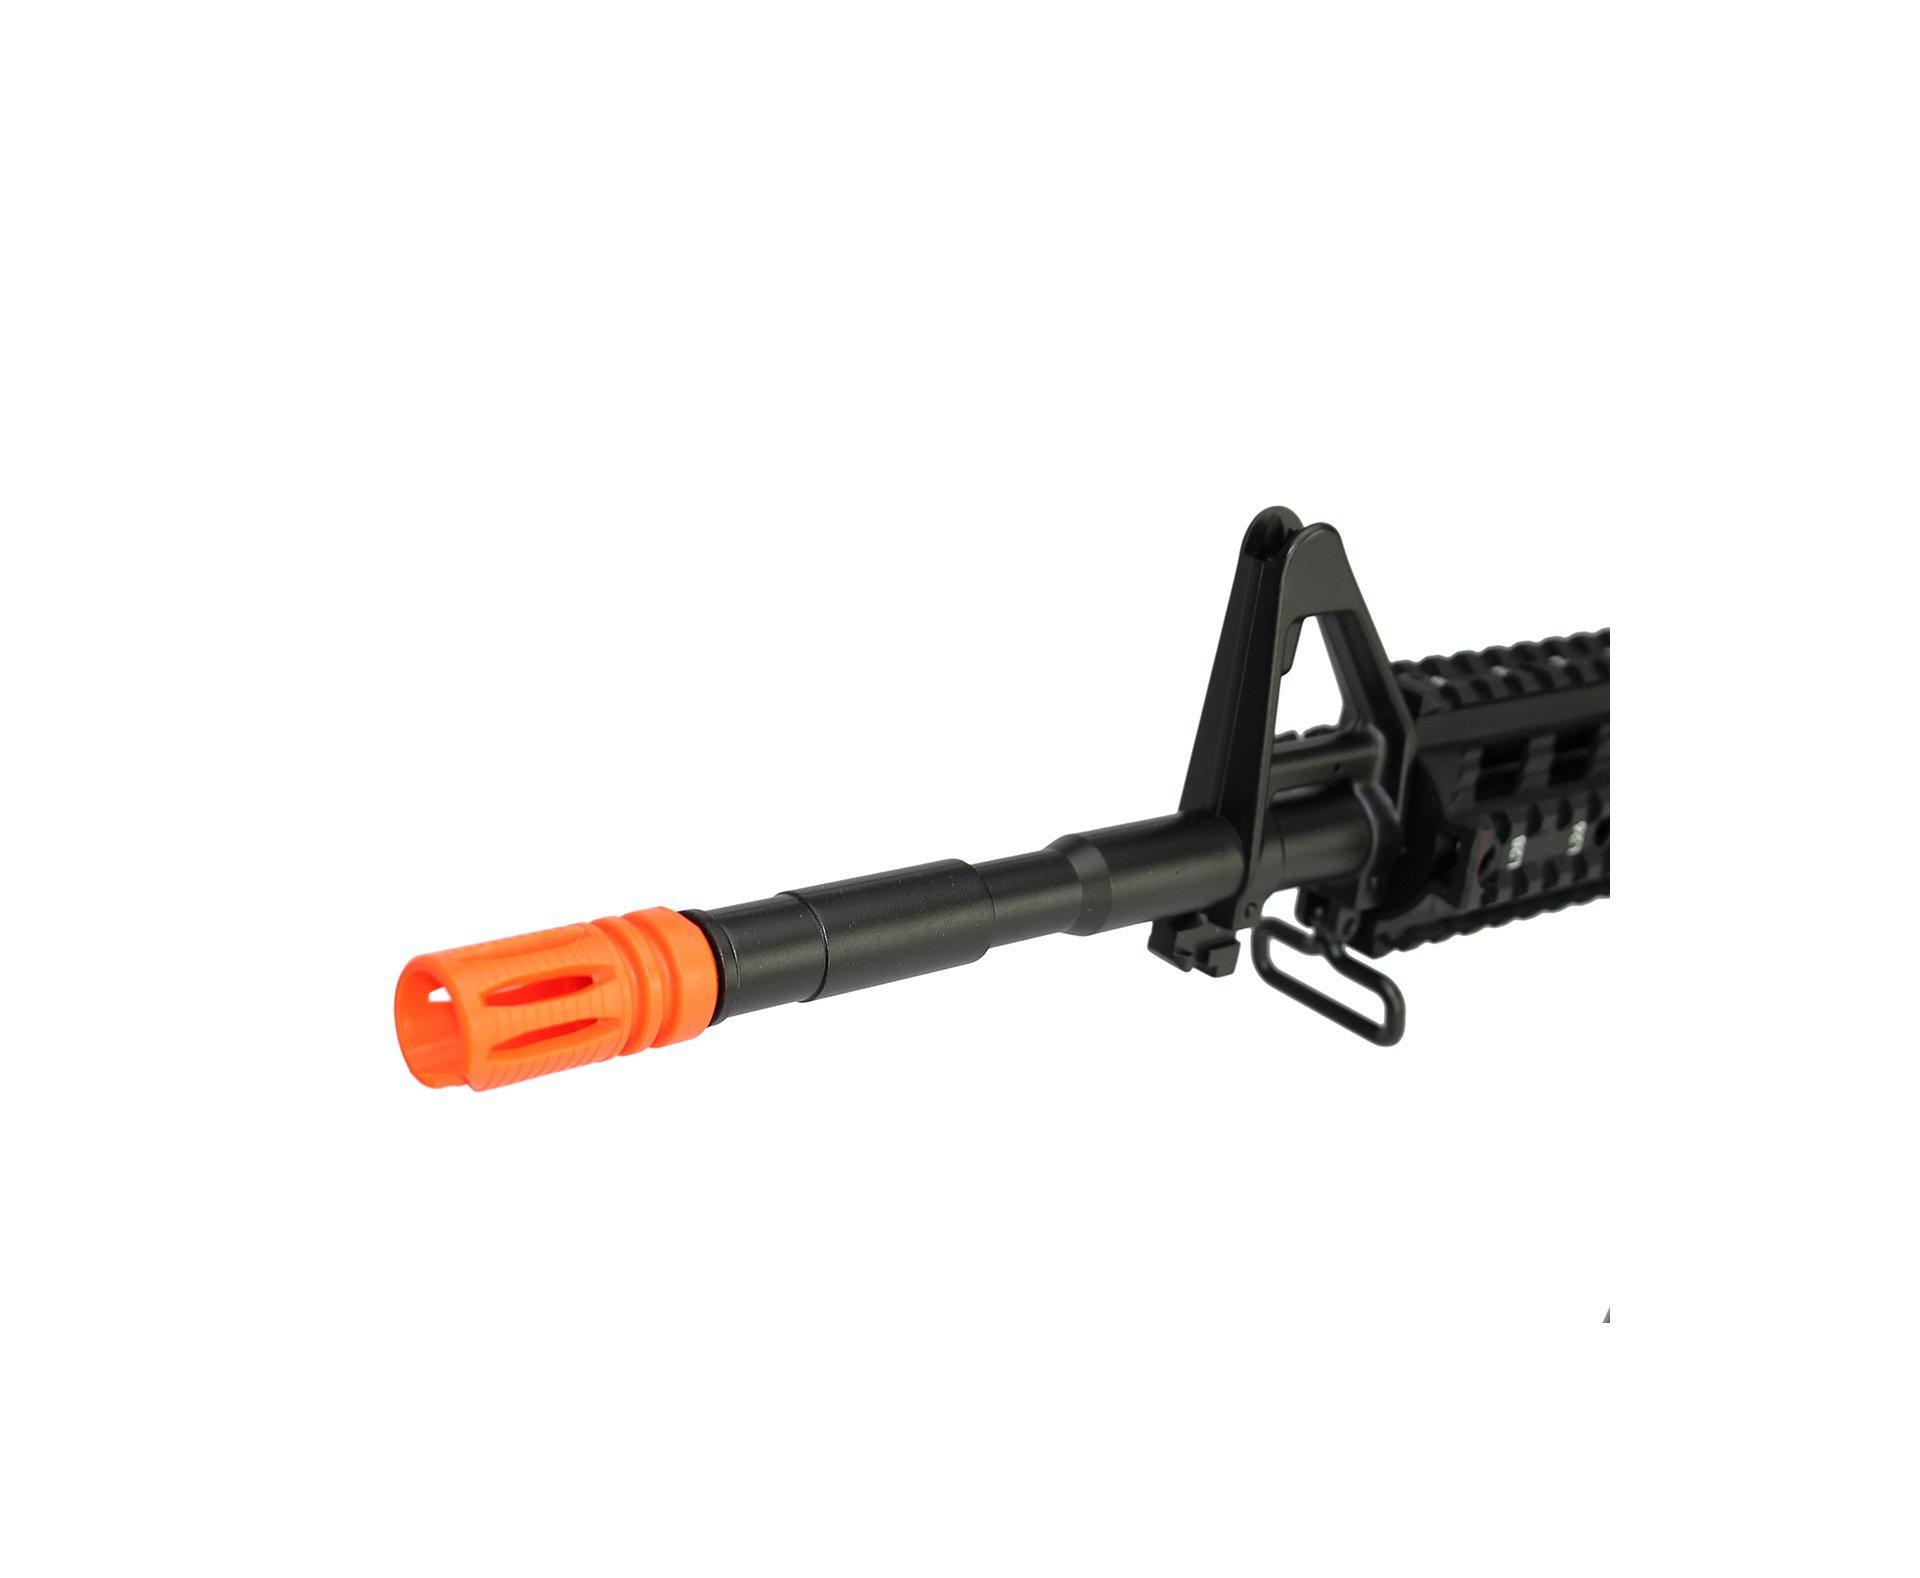 Rifle De Airsoft Cm16 Raider Longo Calibre 6,0 Mm Aeg - G&g